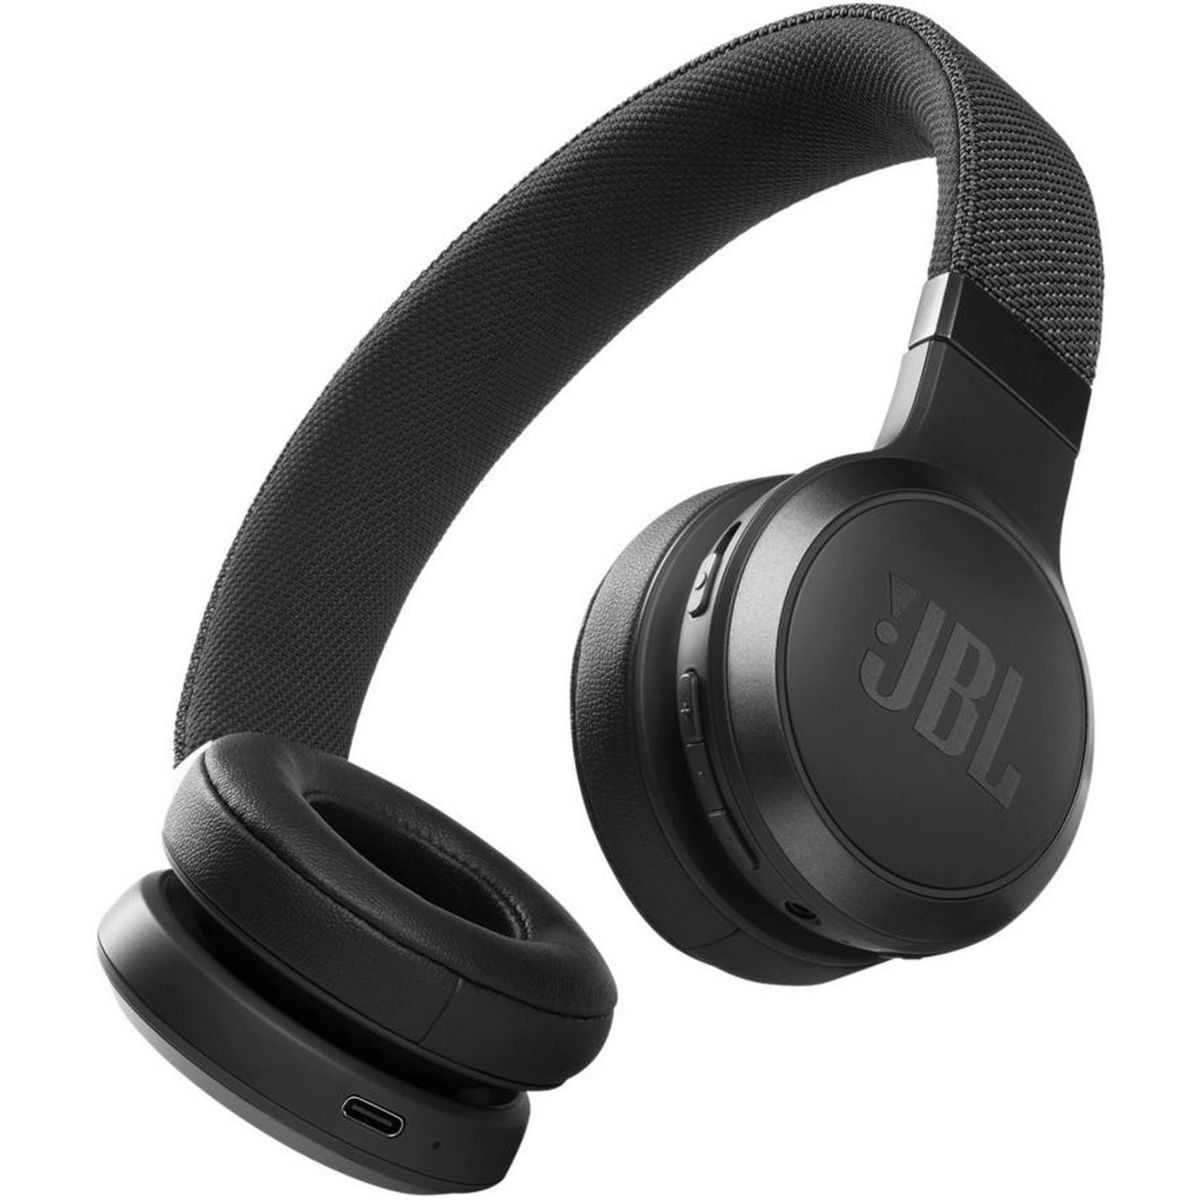 Casque audio Bluetooth - Live 460NC - Noir